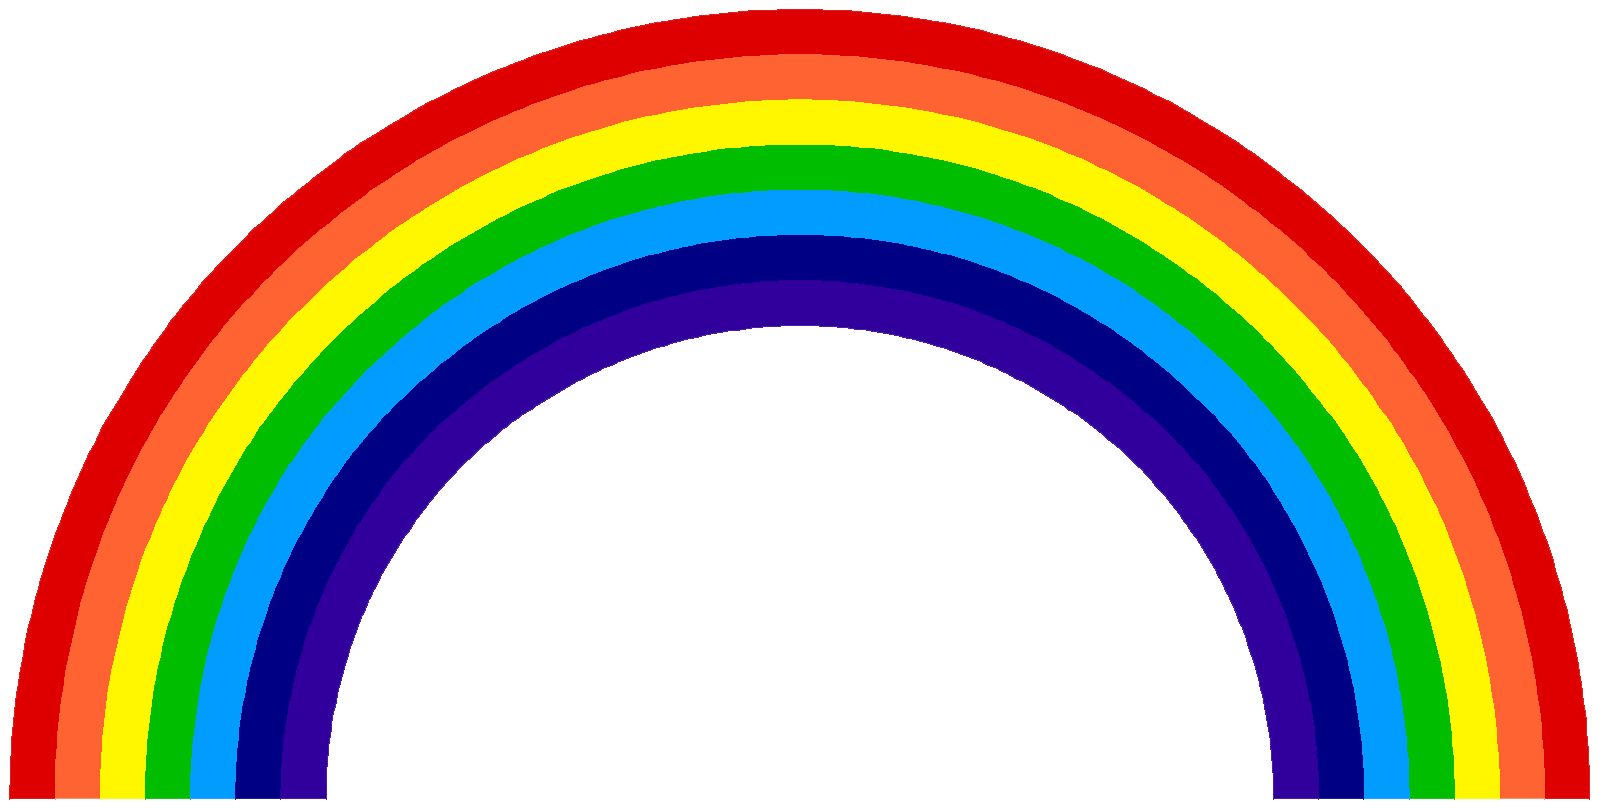 Rainbow HD PNG - 90662